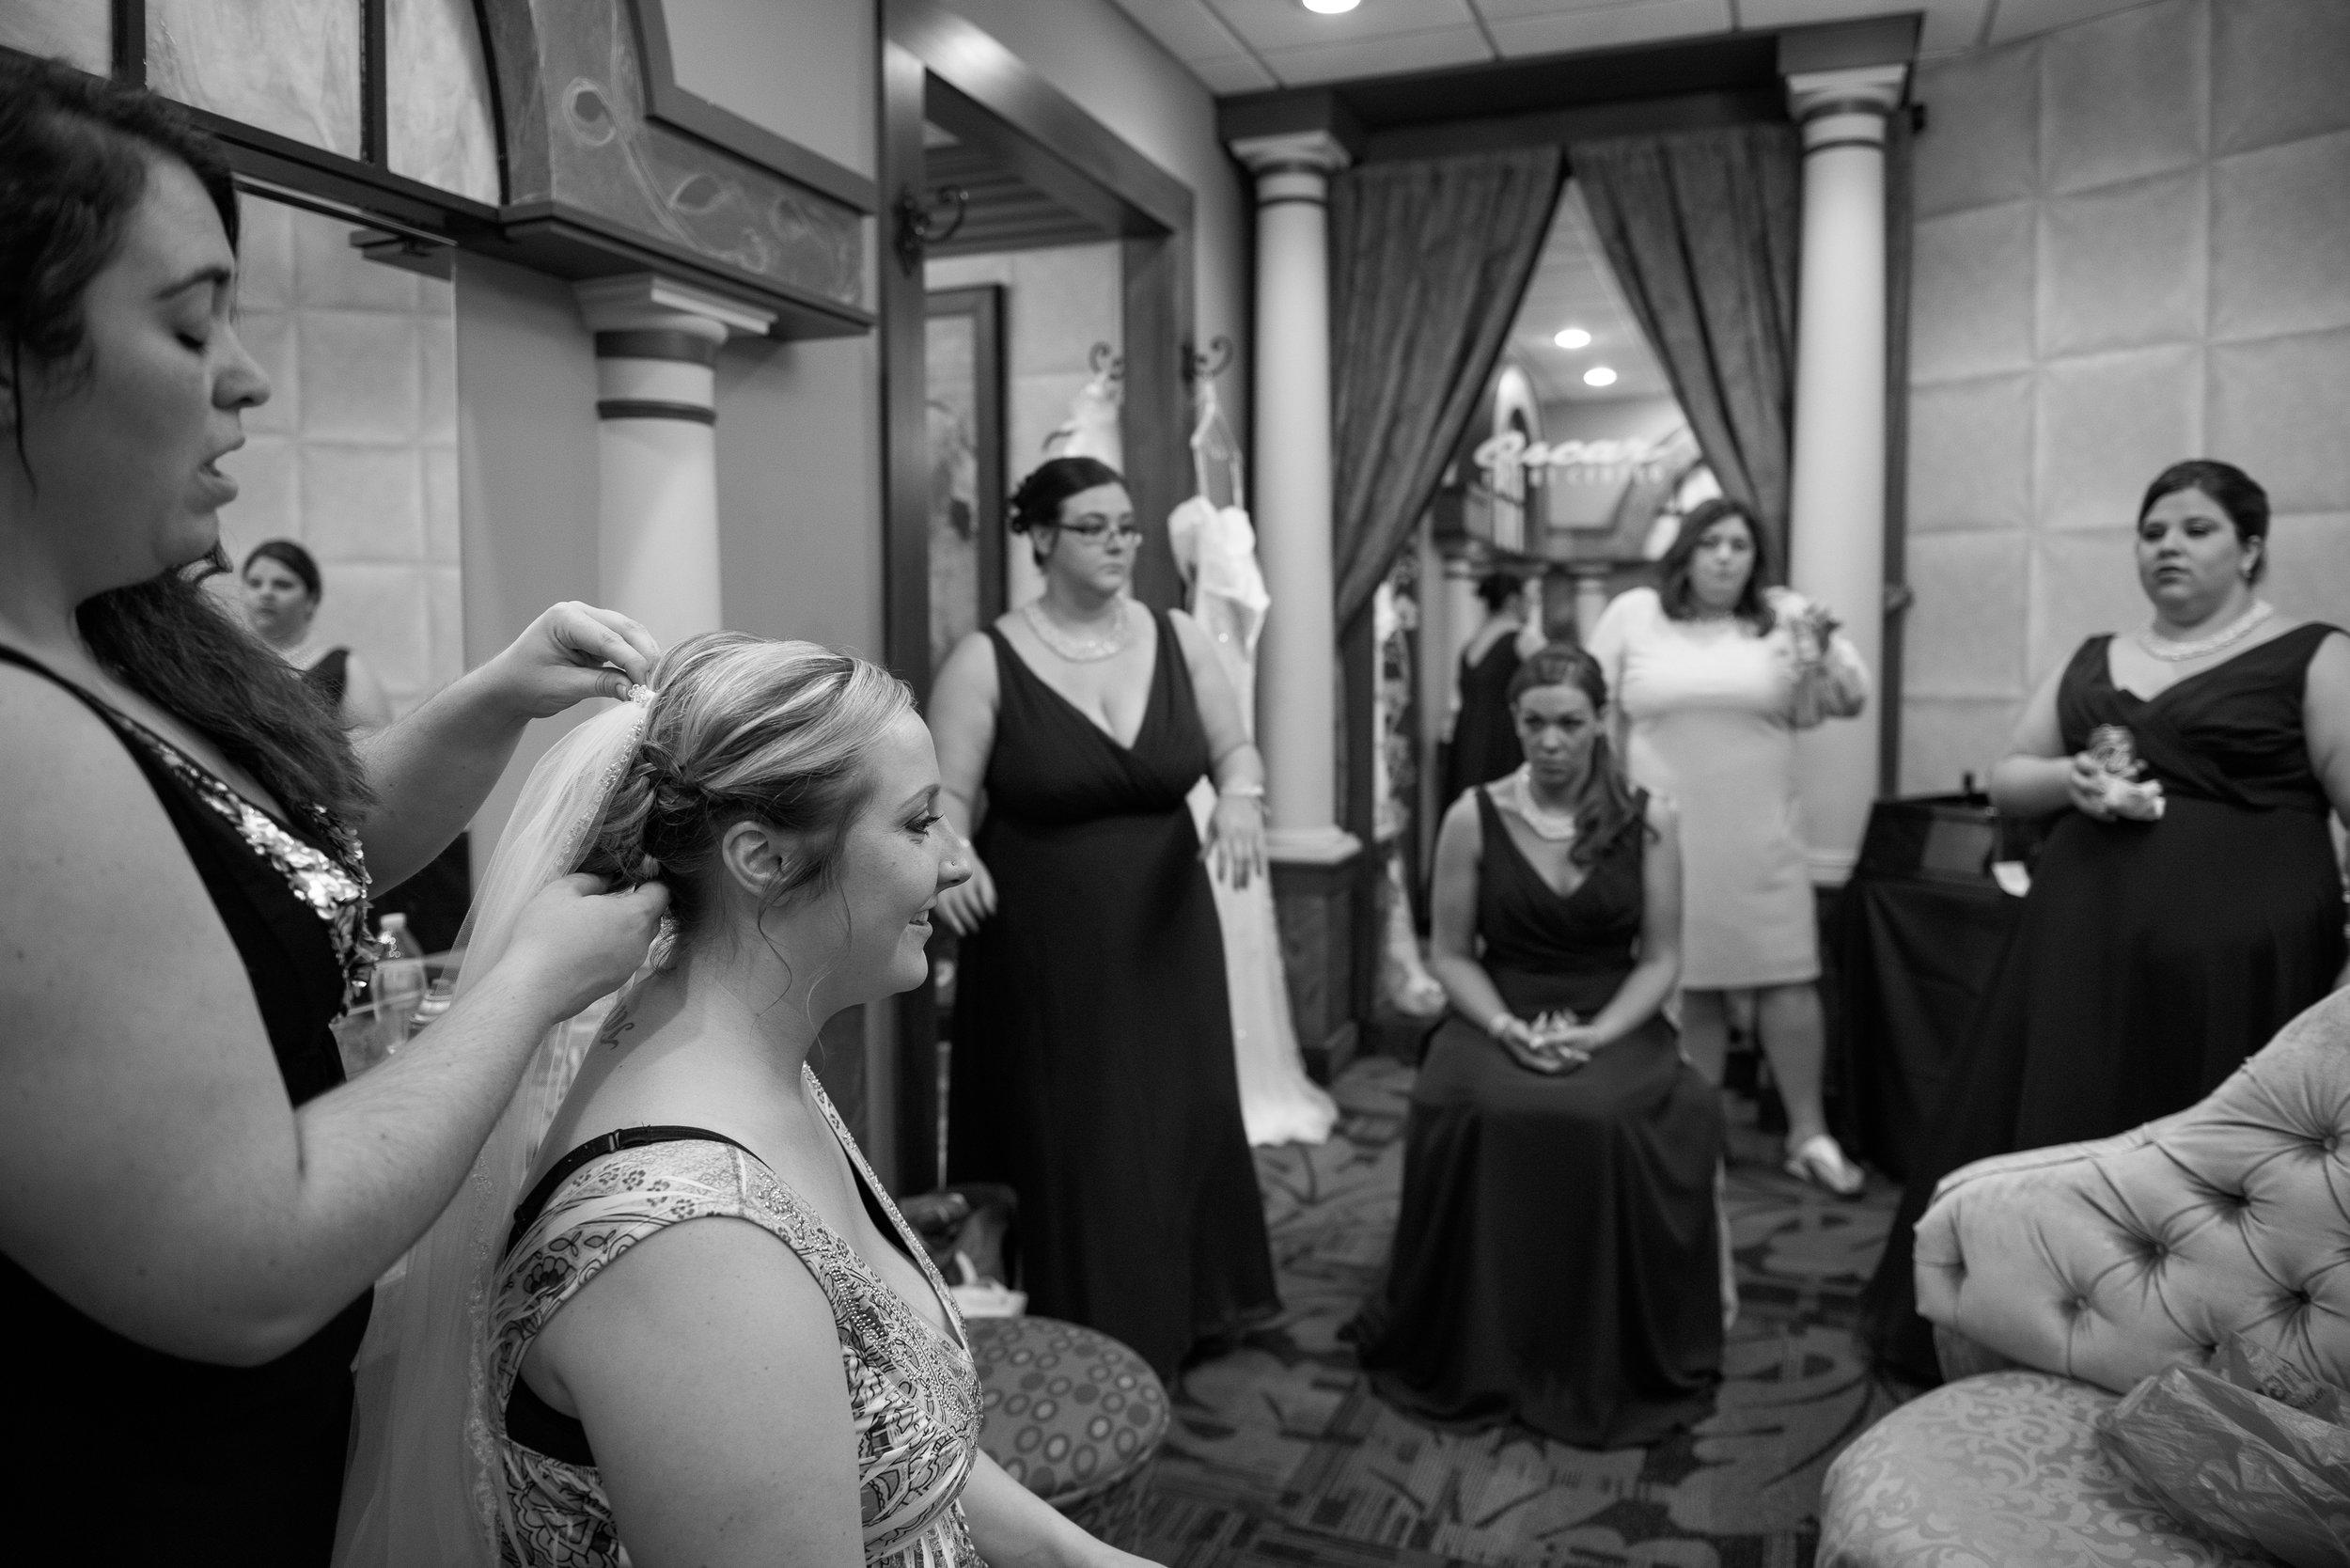 AkersKing_wedding_bw-180 copy.jpg